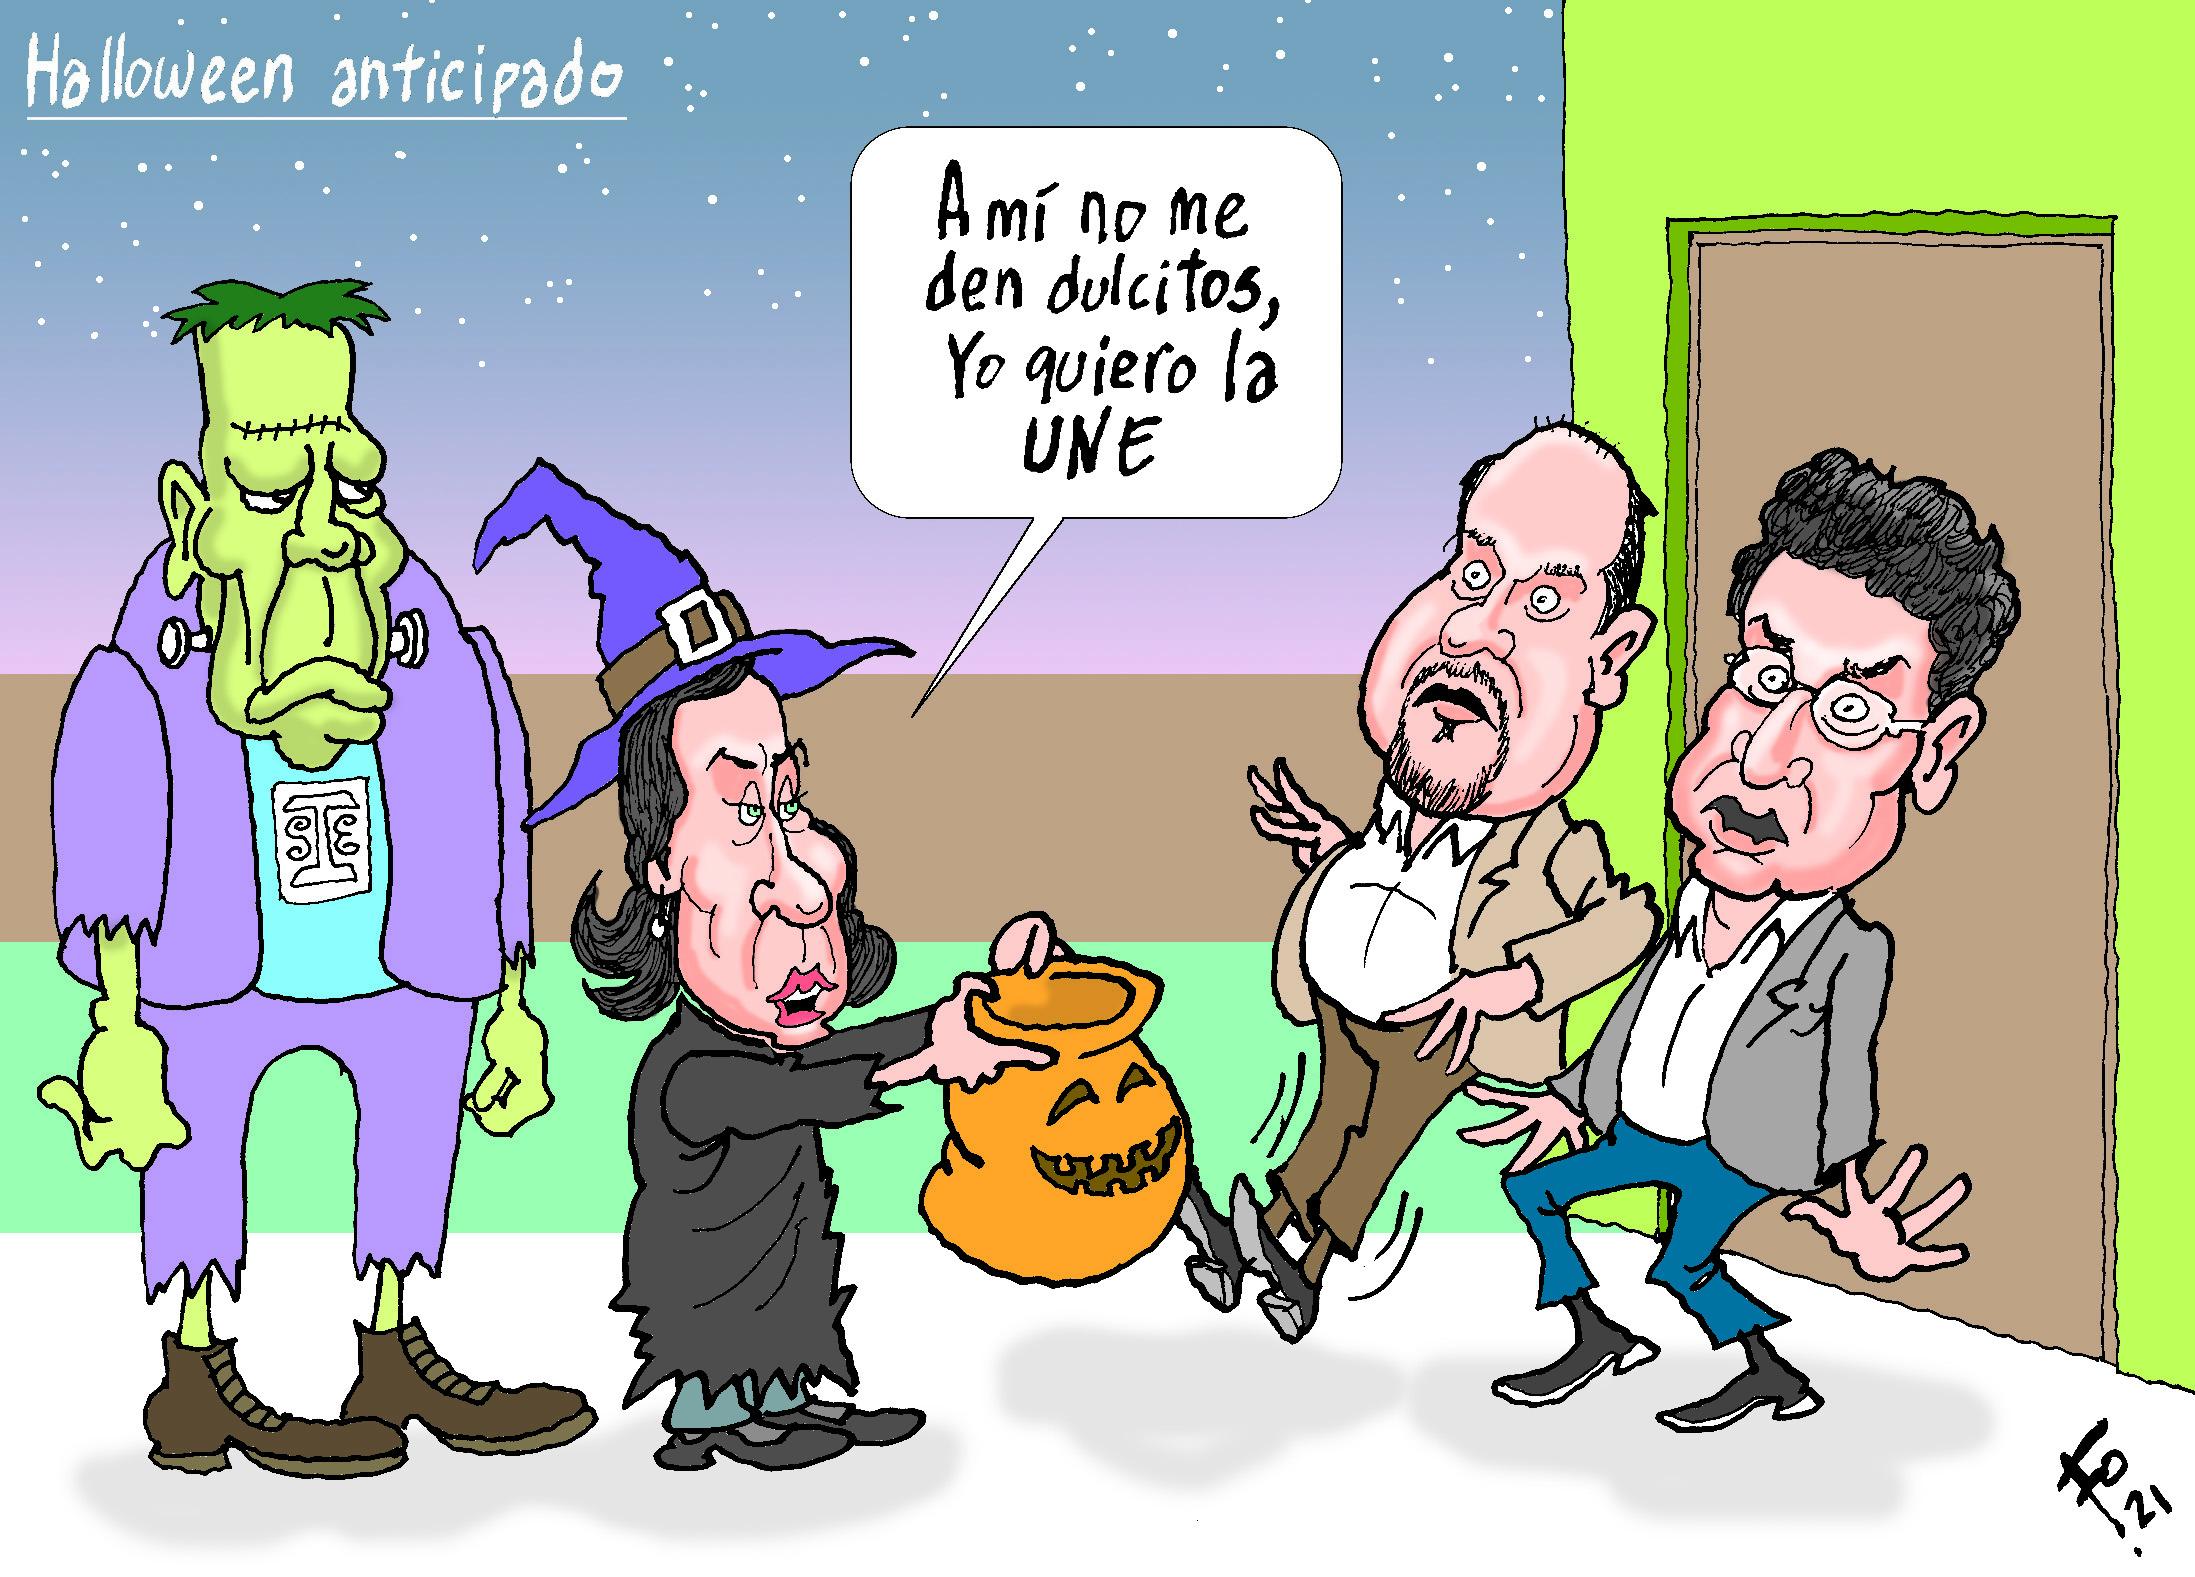 Halloween planeado